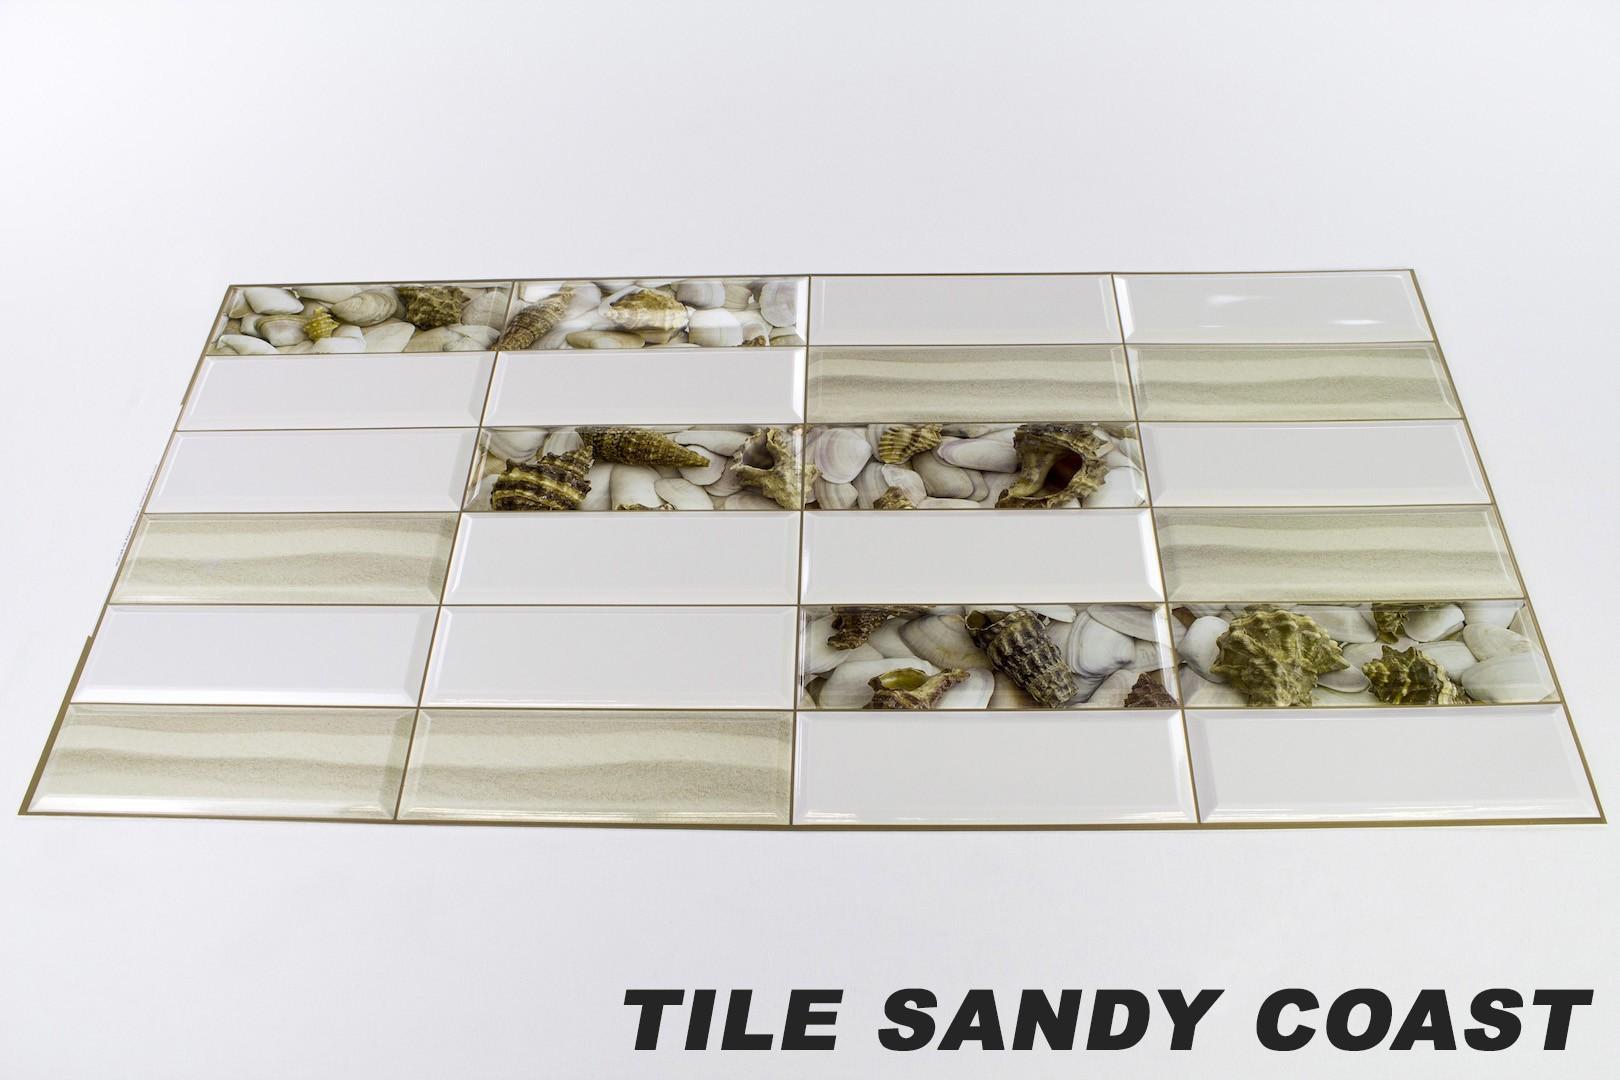 Tile sandy coast originalbild